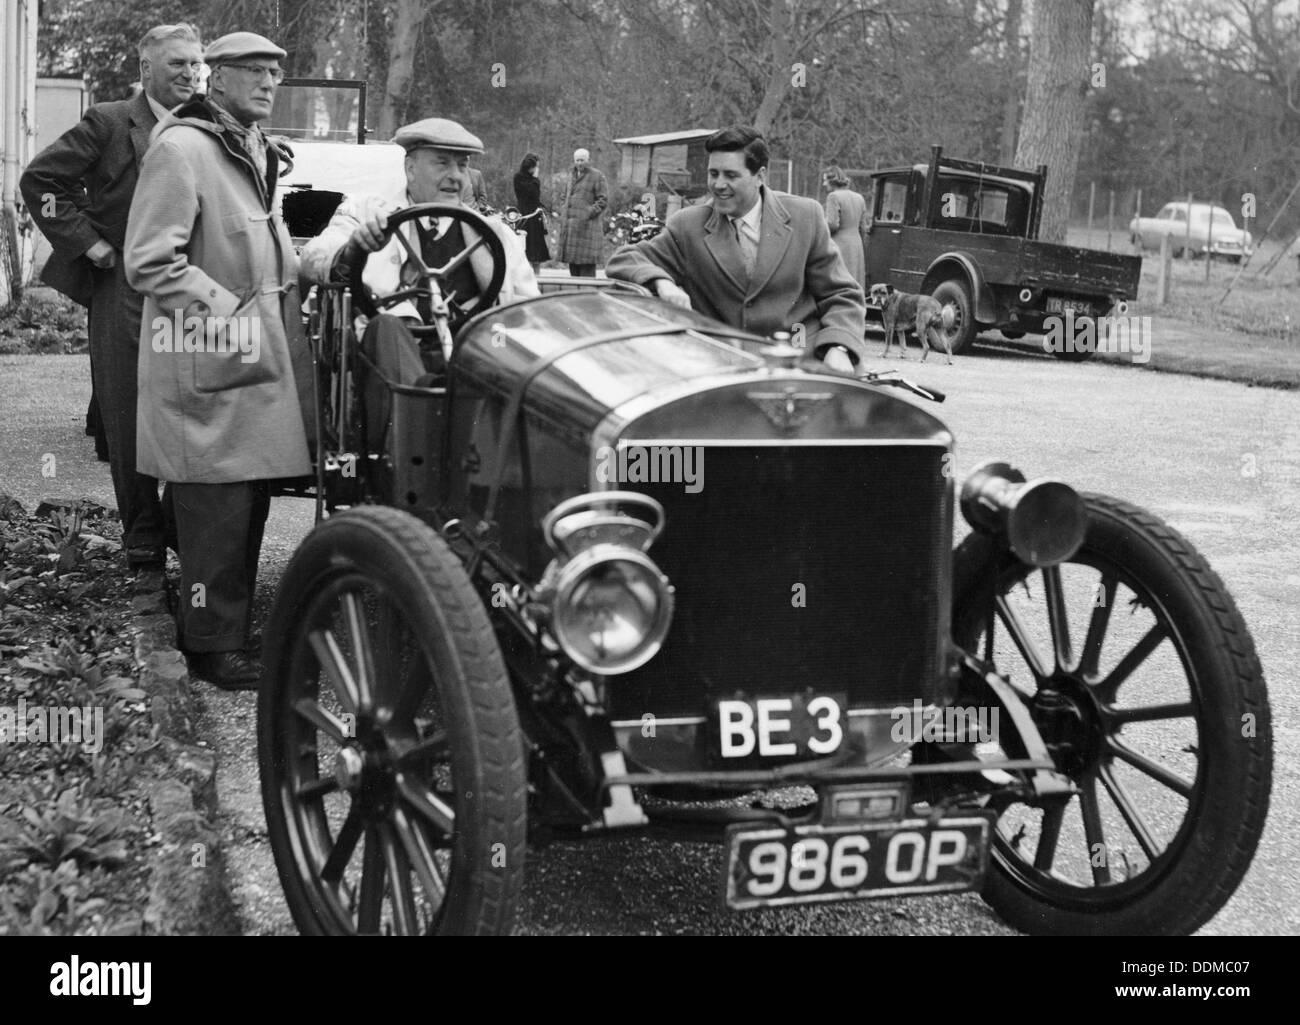 Lord Brabazon in den Fahrersitz eines Oldtimers, 1956. Stockbild